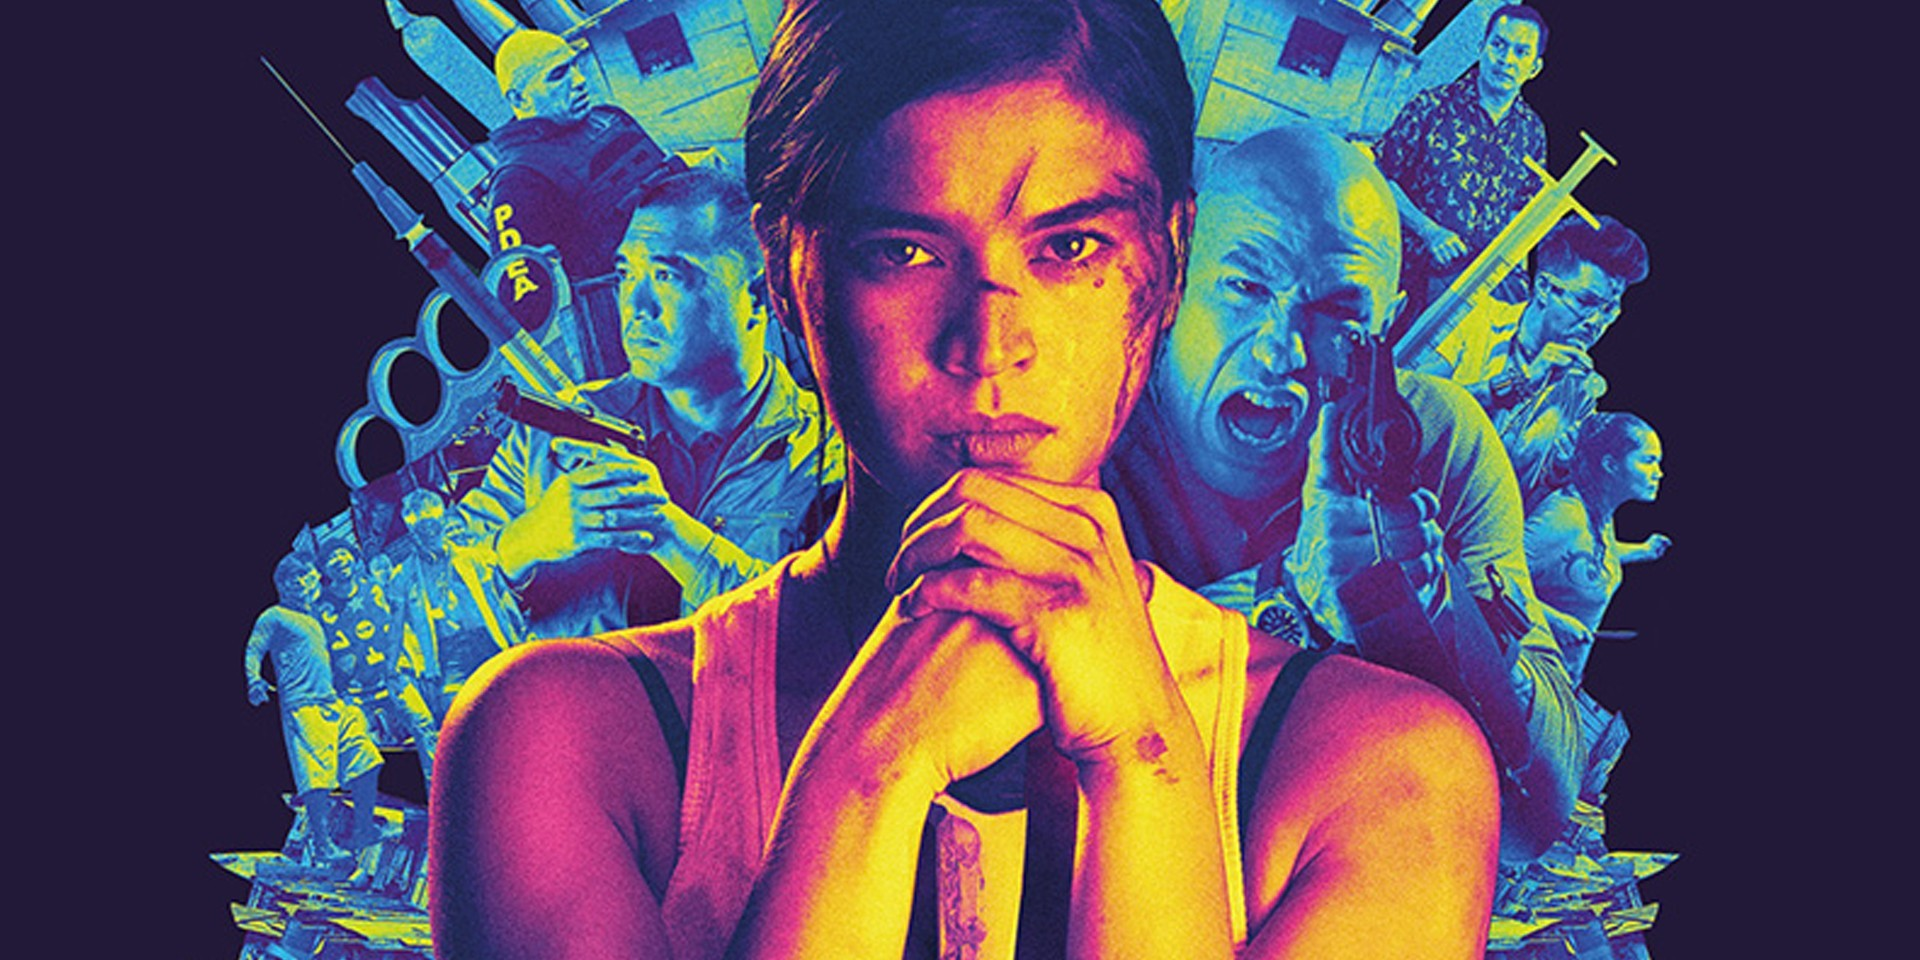 Greyhoundz lend 'Shoot to Kill' to Erik Matti's new film, BuyBust